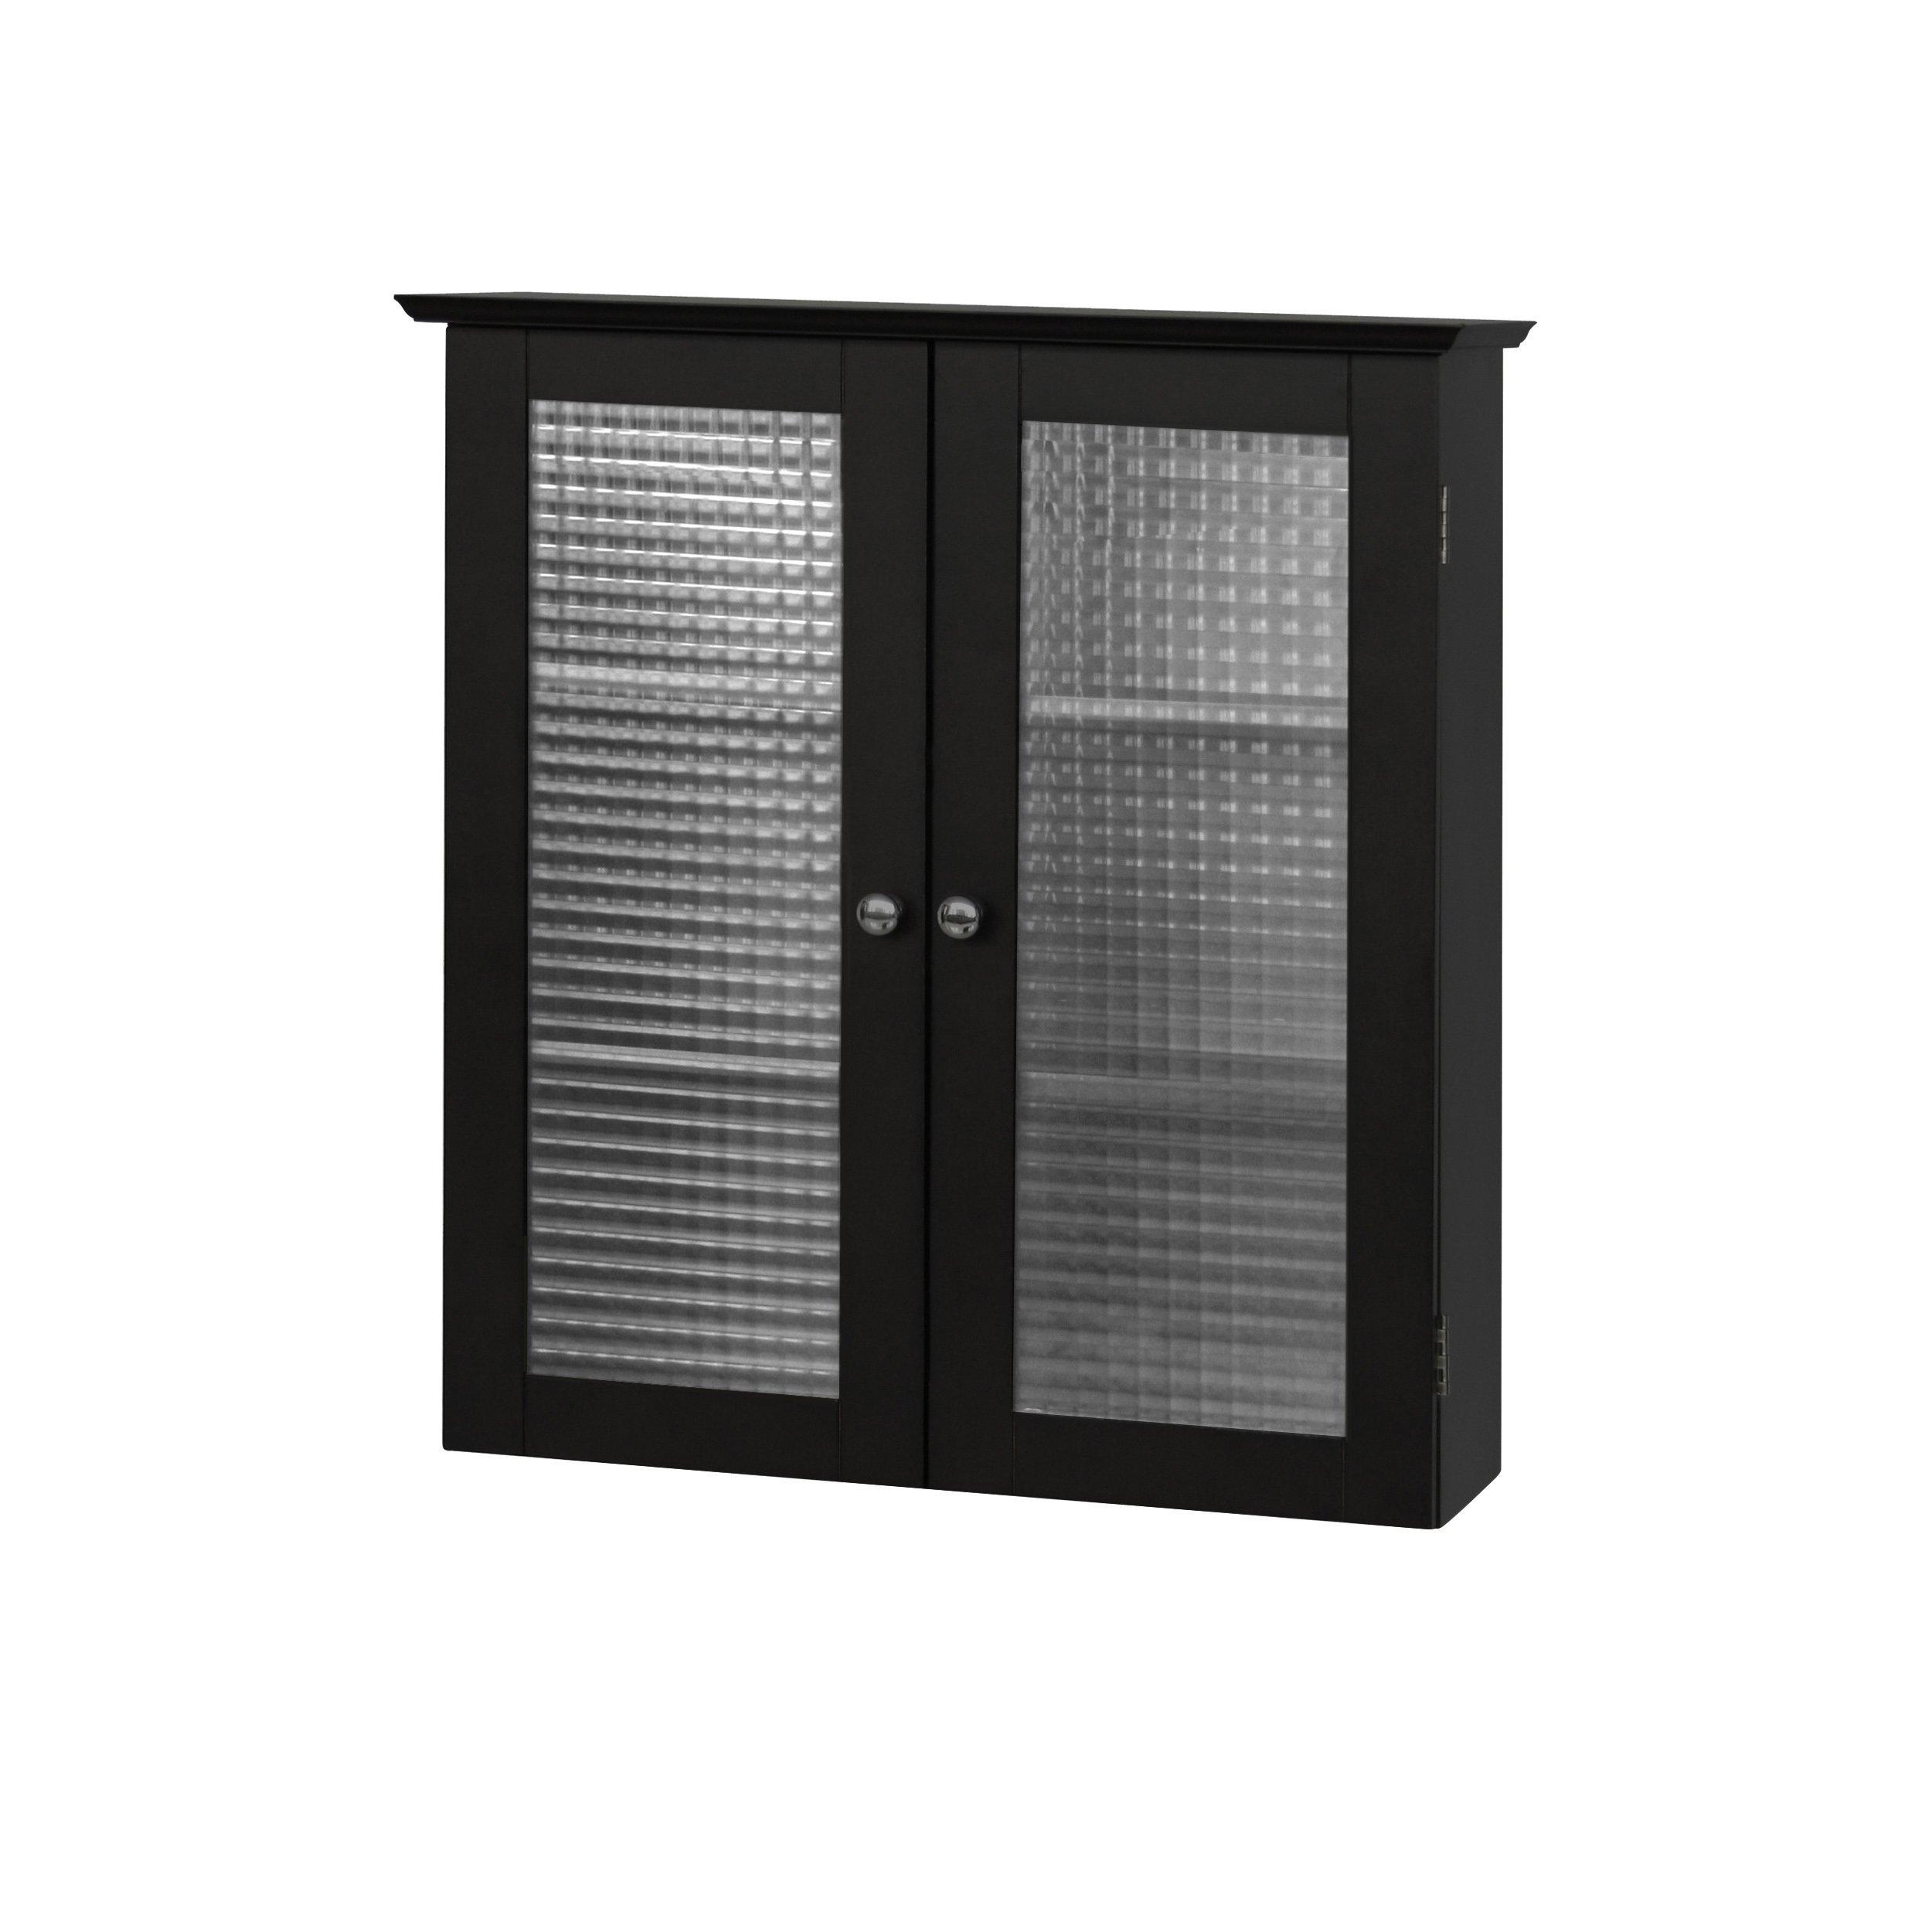 Elegant Home Fashions Chesterfield Wall Cabinet with Two Glass Doors by Elegant Home Fashions (Image #3)